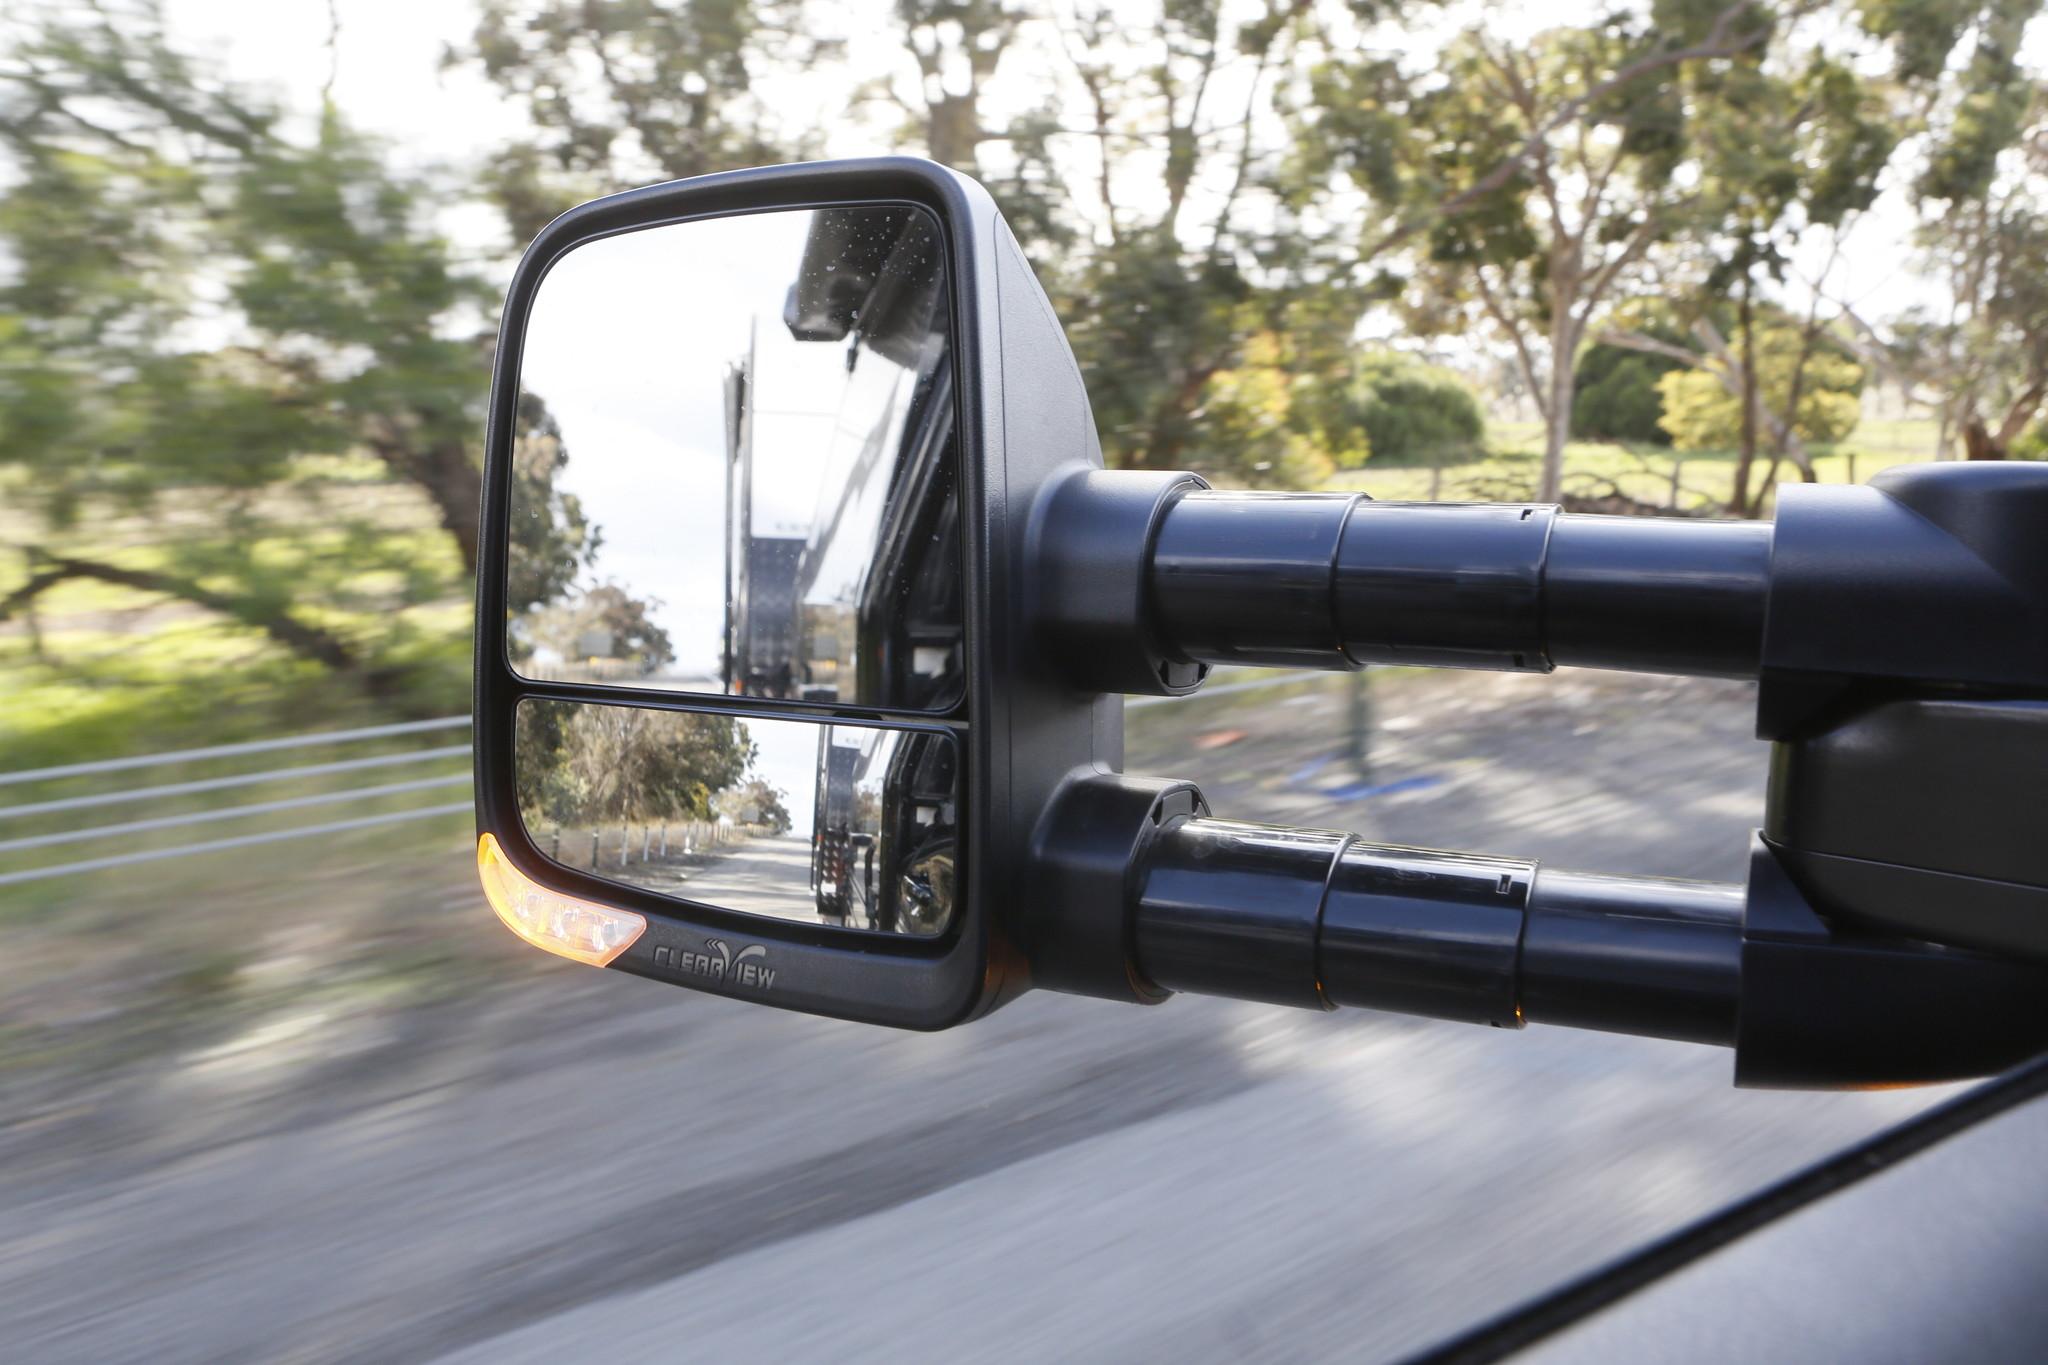 Toyota Next Generation Mirrors Toyota Land Cruiser 200 serie